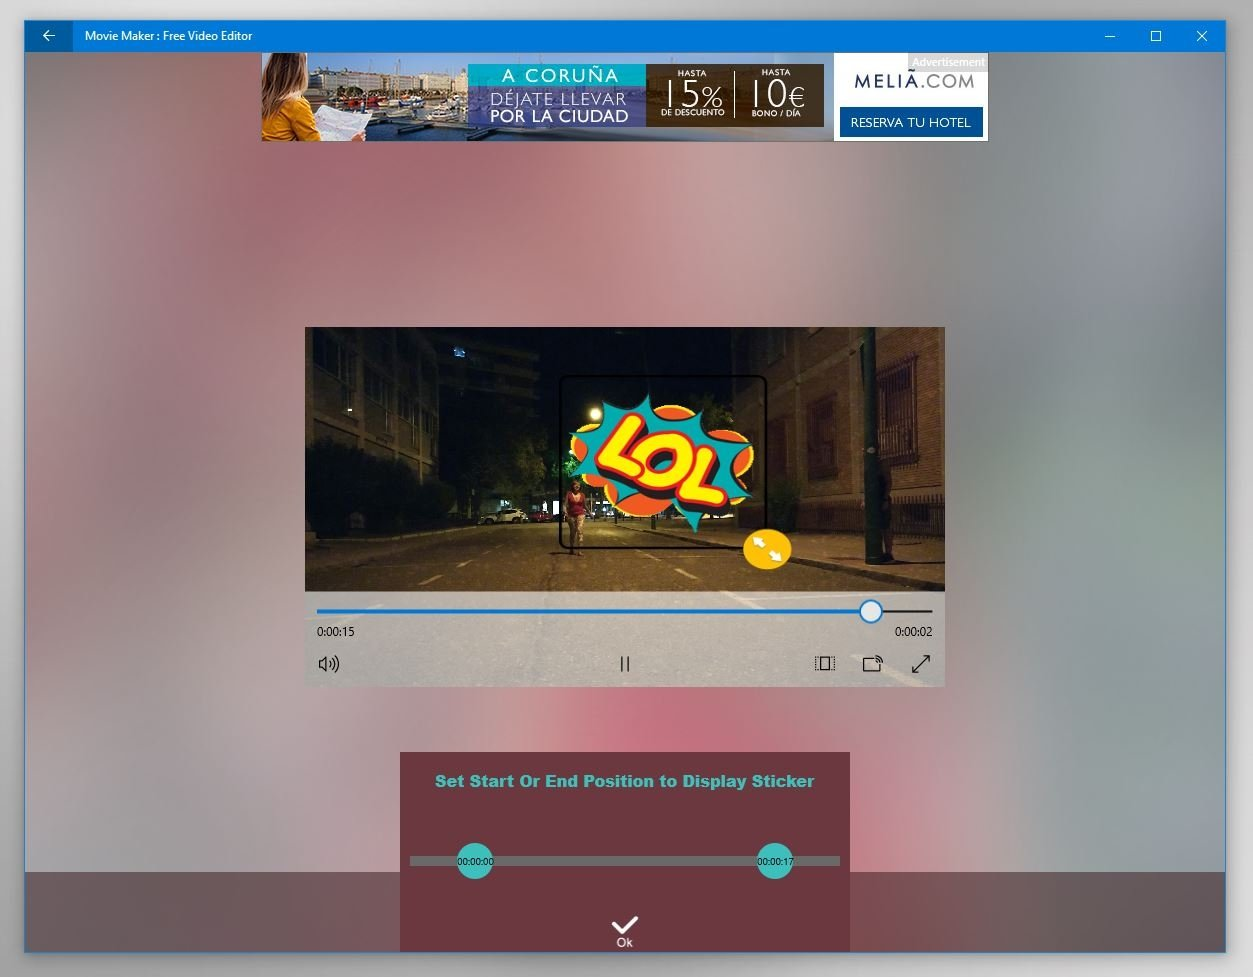 microsoft movie maker windows 7 free download full version